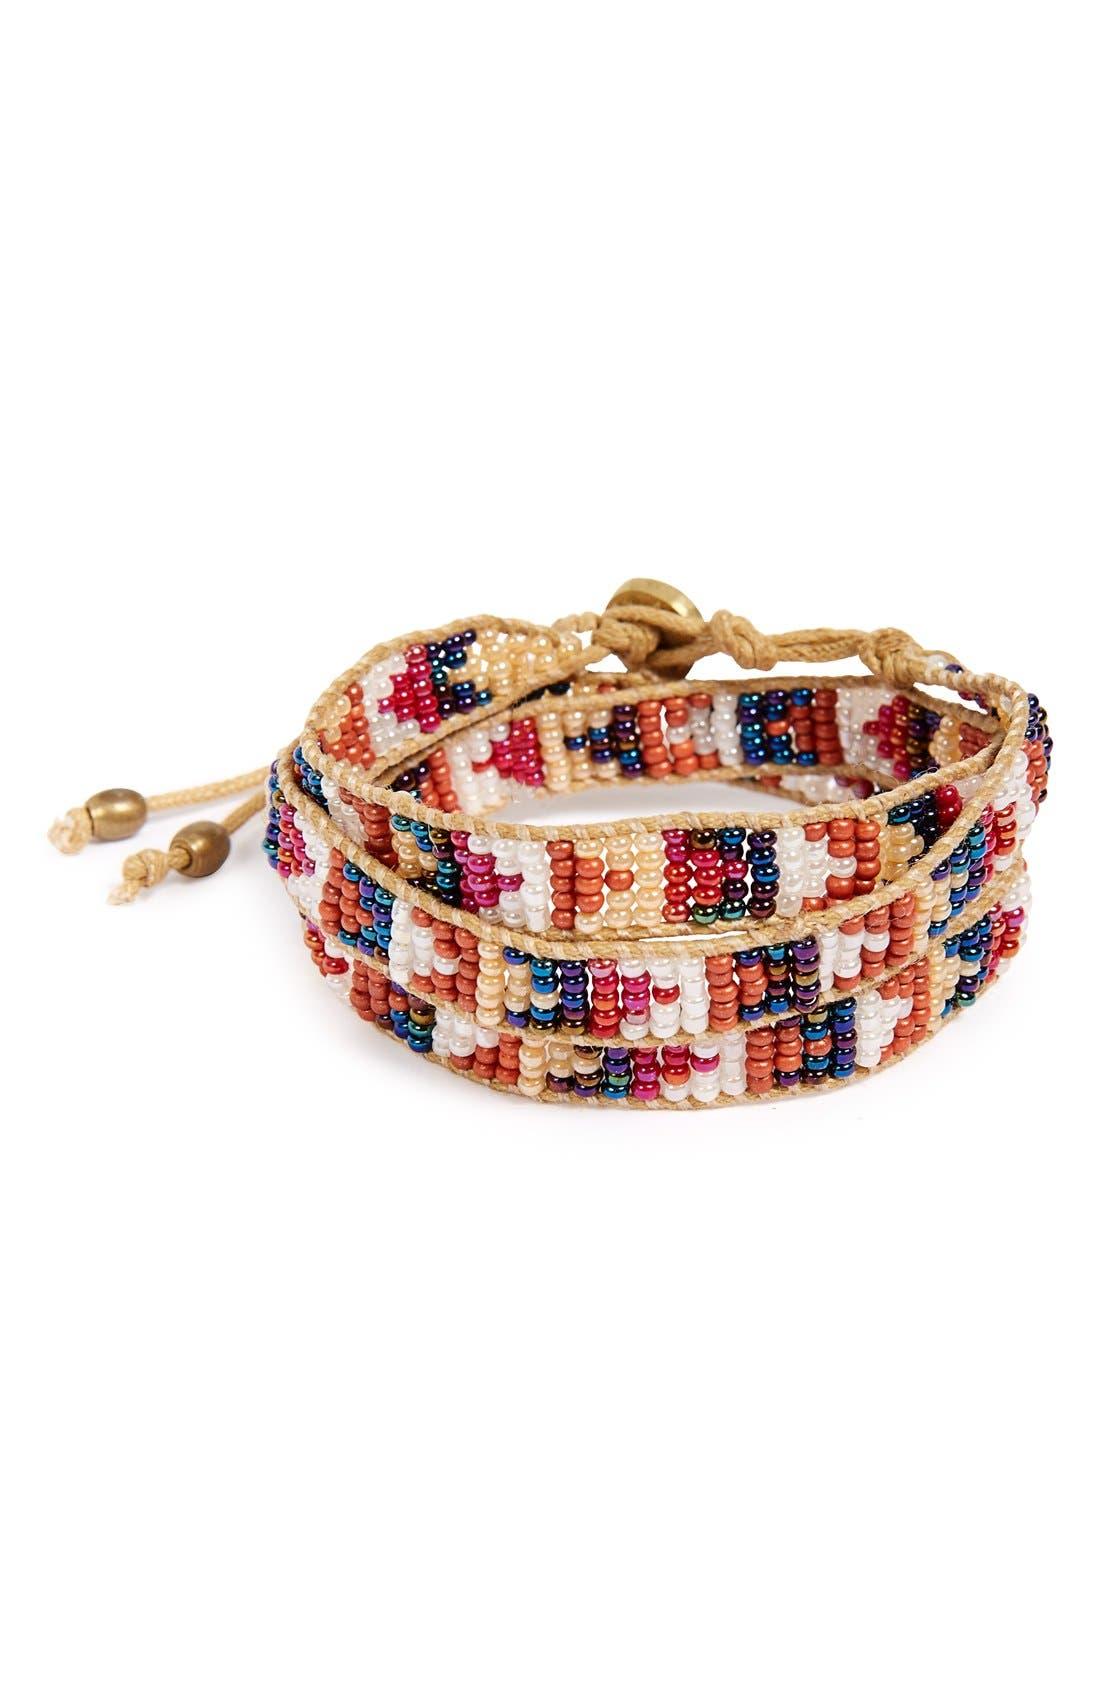 Alternate Image 1 Selected - Me to We 'Mambo' Bead Wrap Bracelet